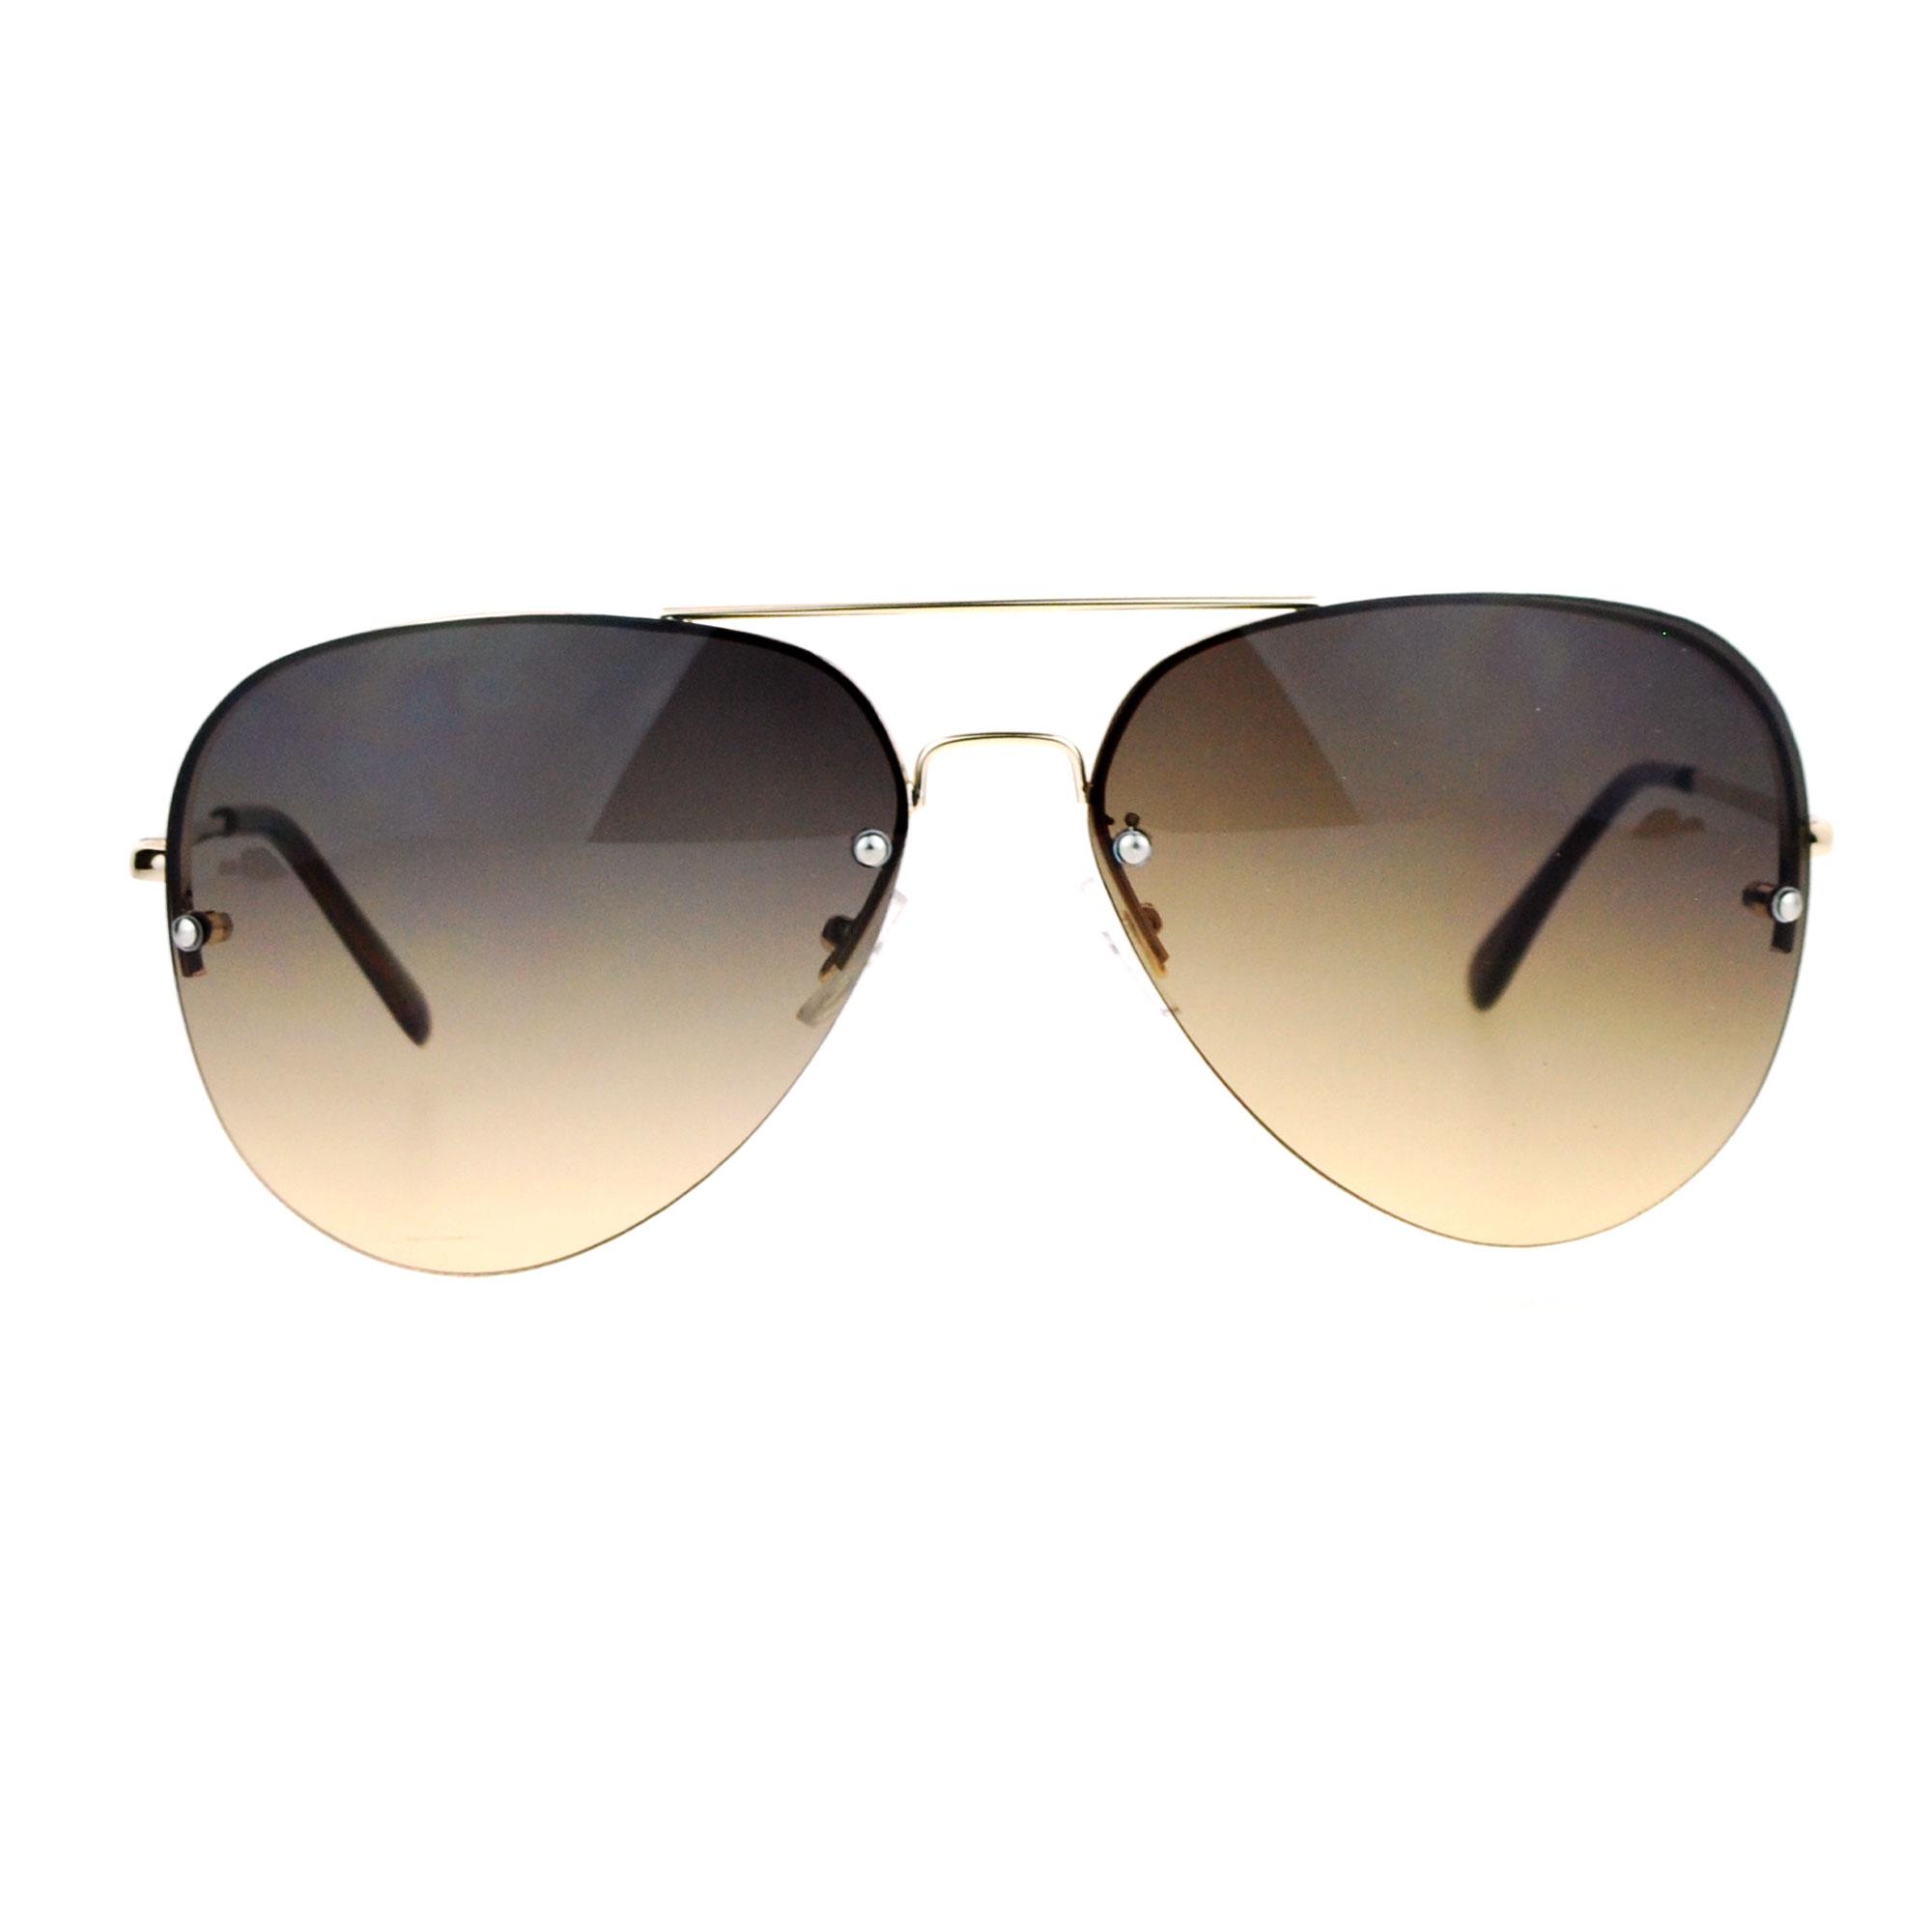 Rimless Aviator Sunglasses : SA106 Color Rimless Oceanic Gradient Aviator Sunglasses eBay